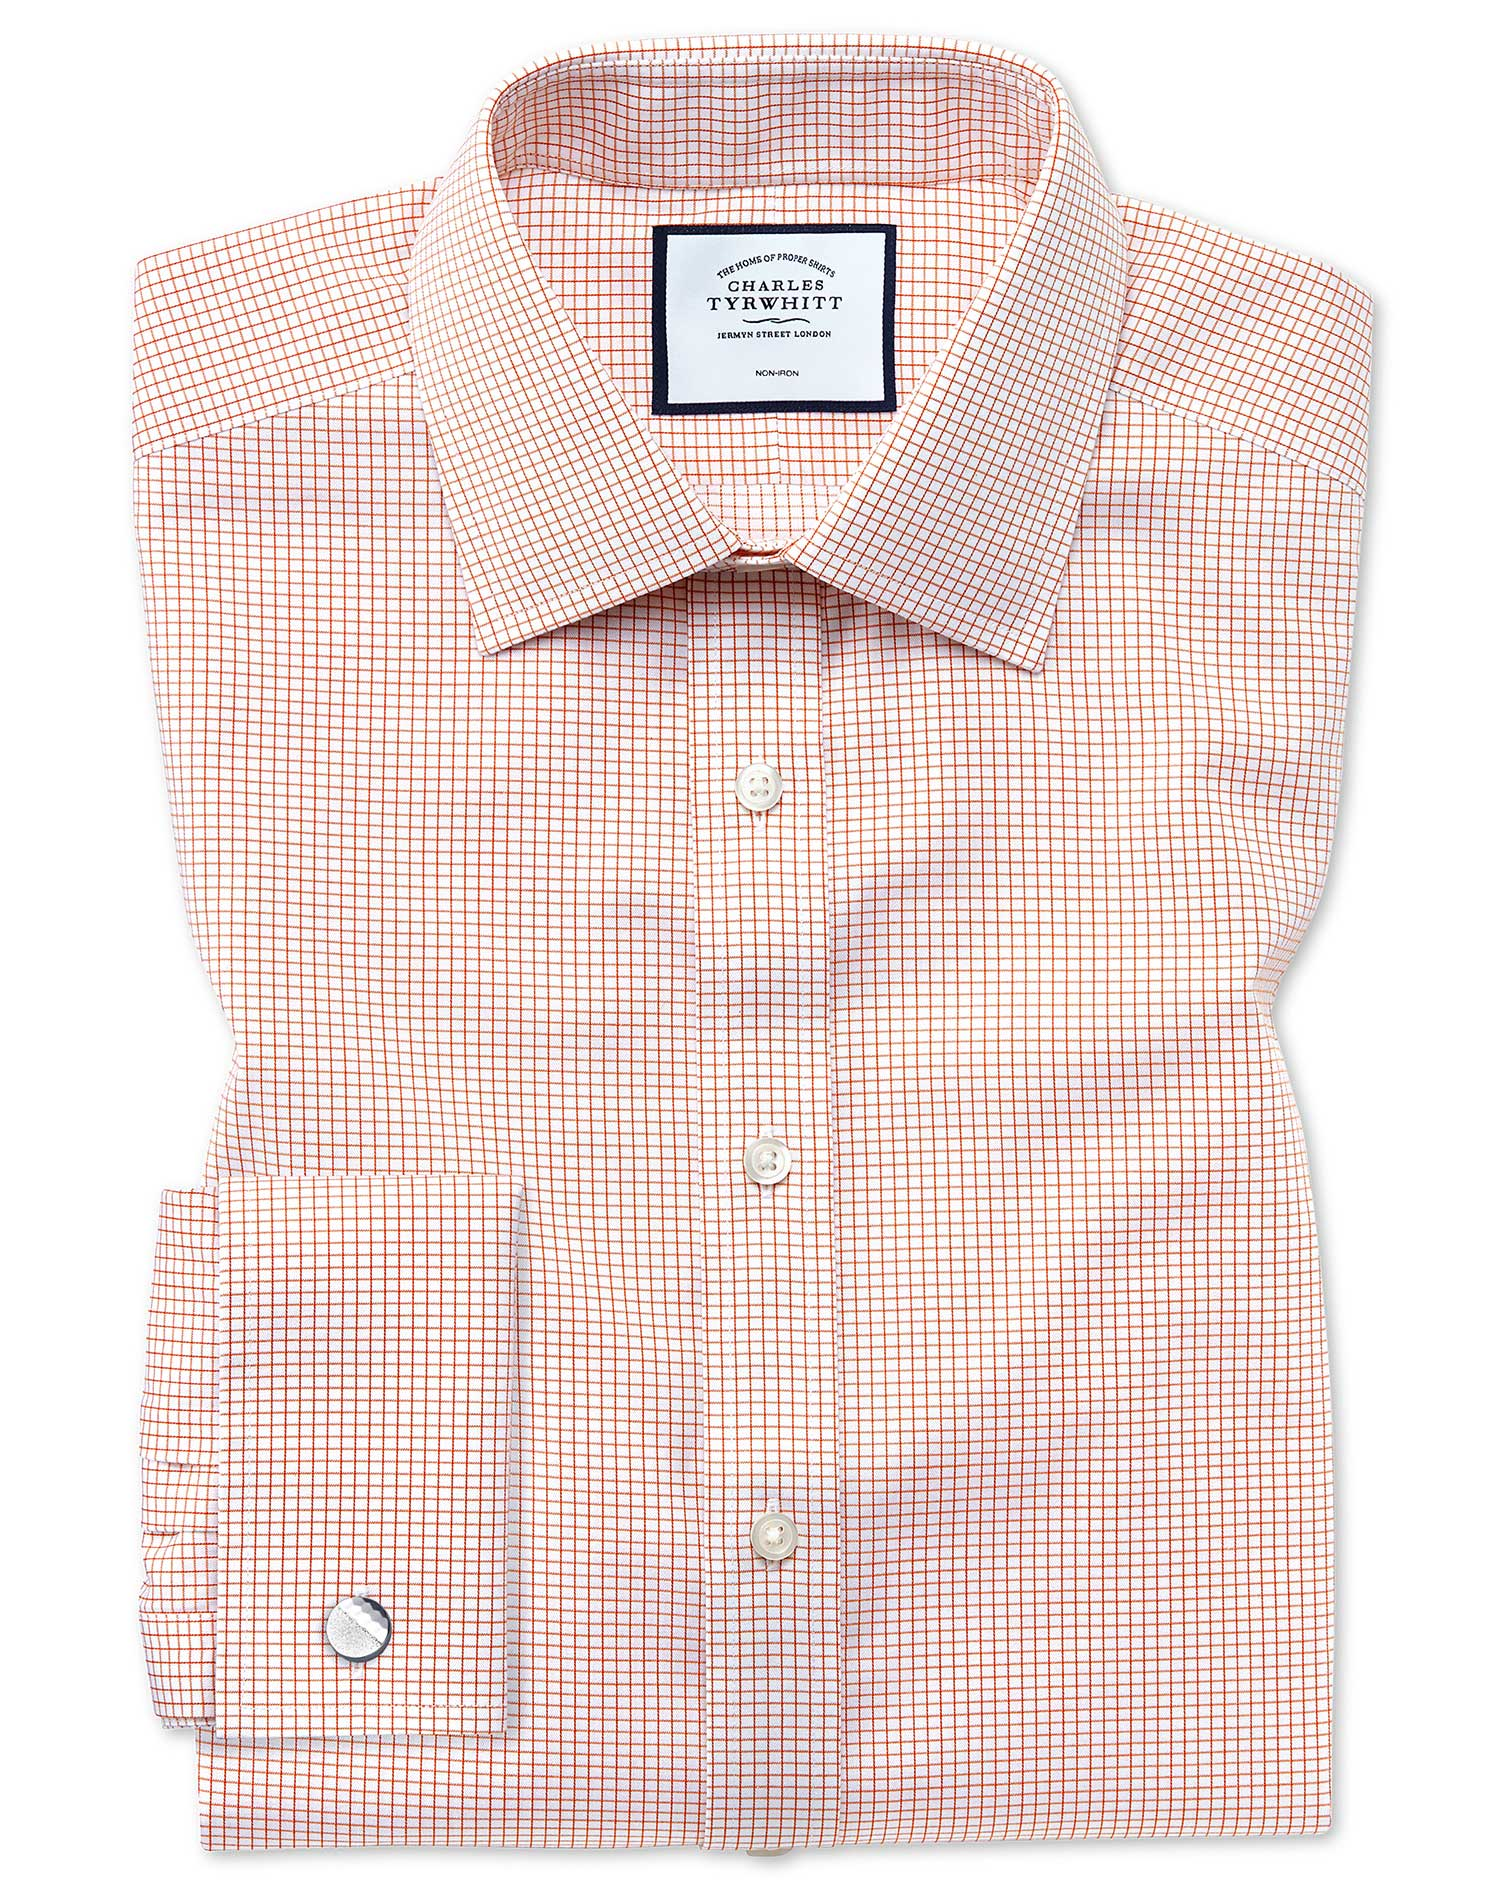 Slim Fit Non-Iron Twill Mini Grid Check Orange Cotton Formal Shirt Single Cuff Size 17.5/34 by Charl